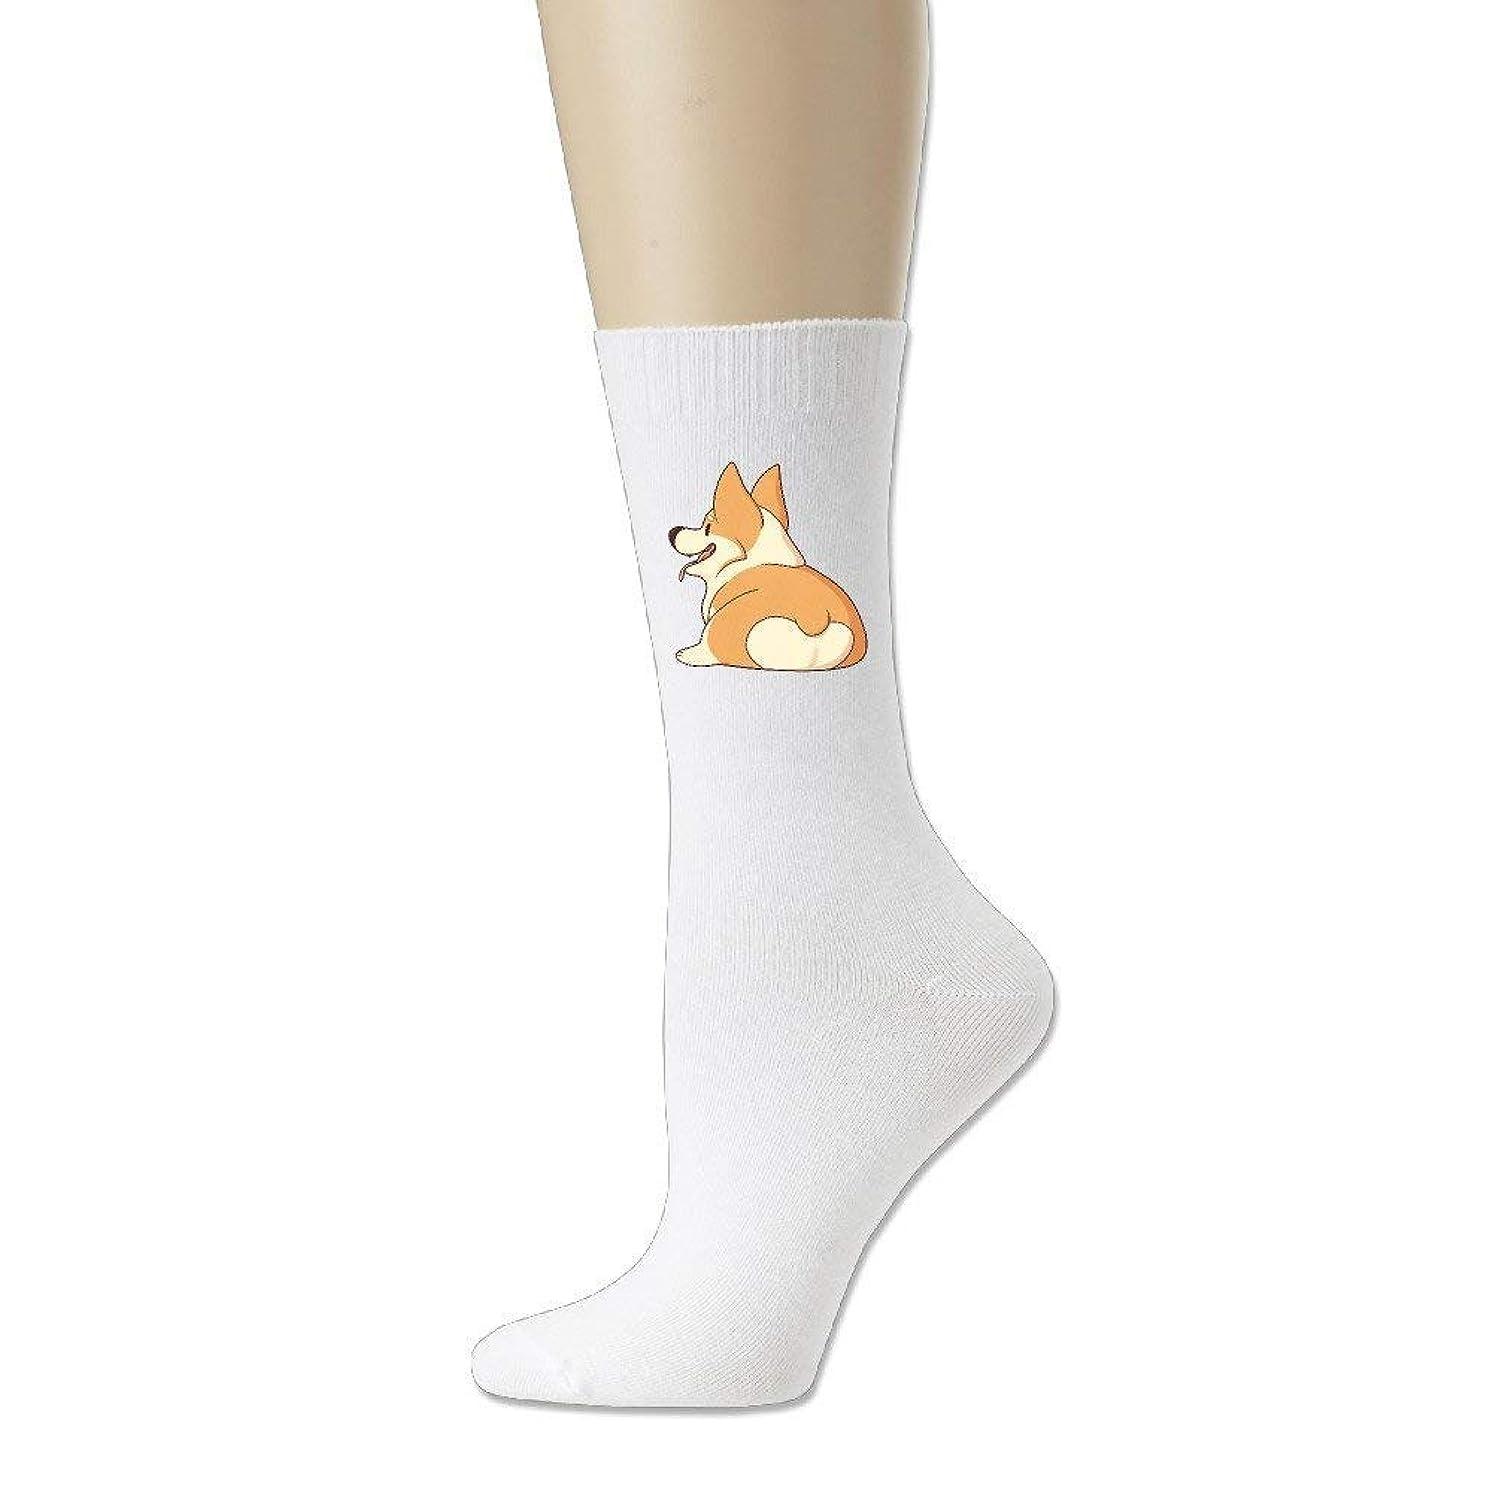 LELE Corgi Butt Comfort Cotton Athletic Ankle High Socks Unisex Youth Adult Girl Boy Women Men